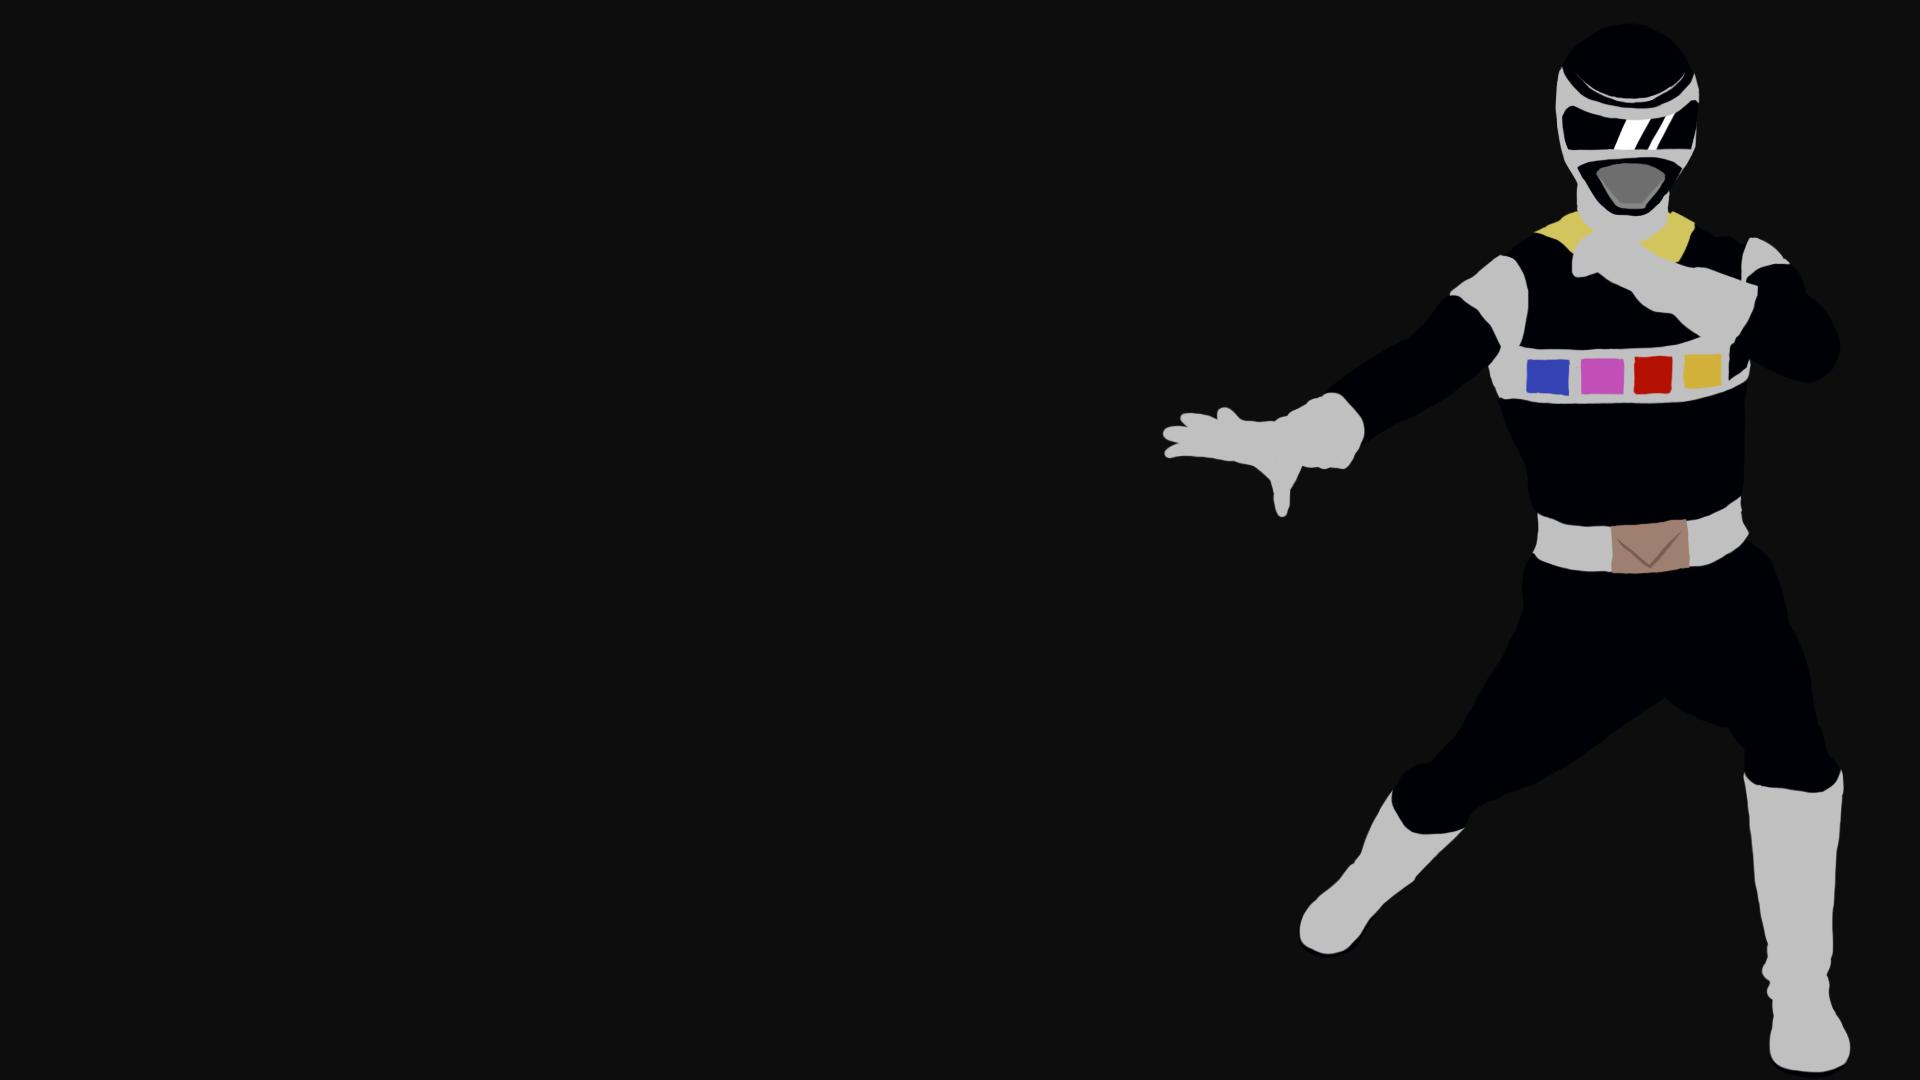 Black Ranger Power Rangers In Space By Travp333 On Deviantart